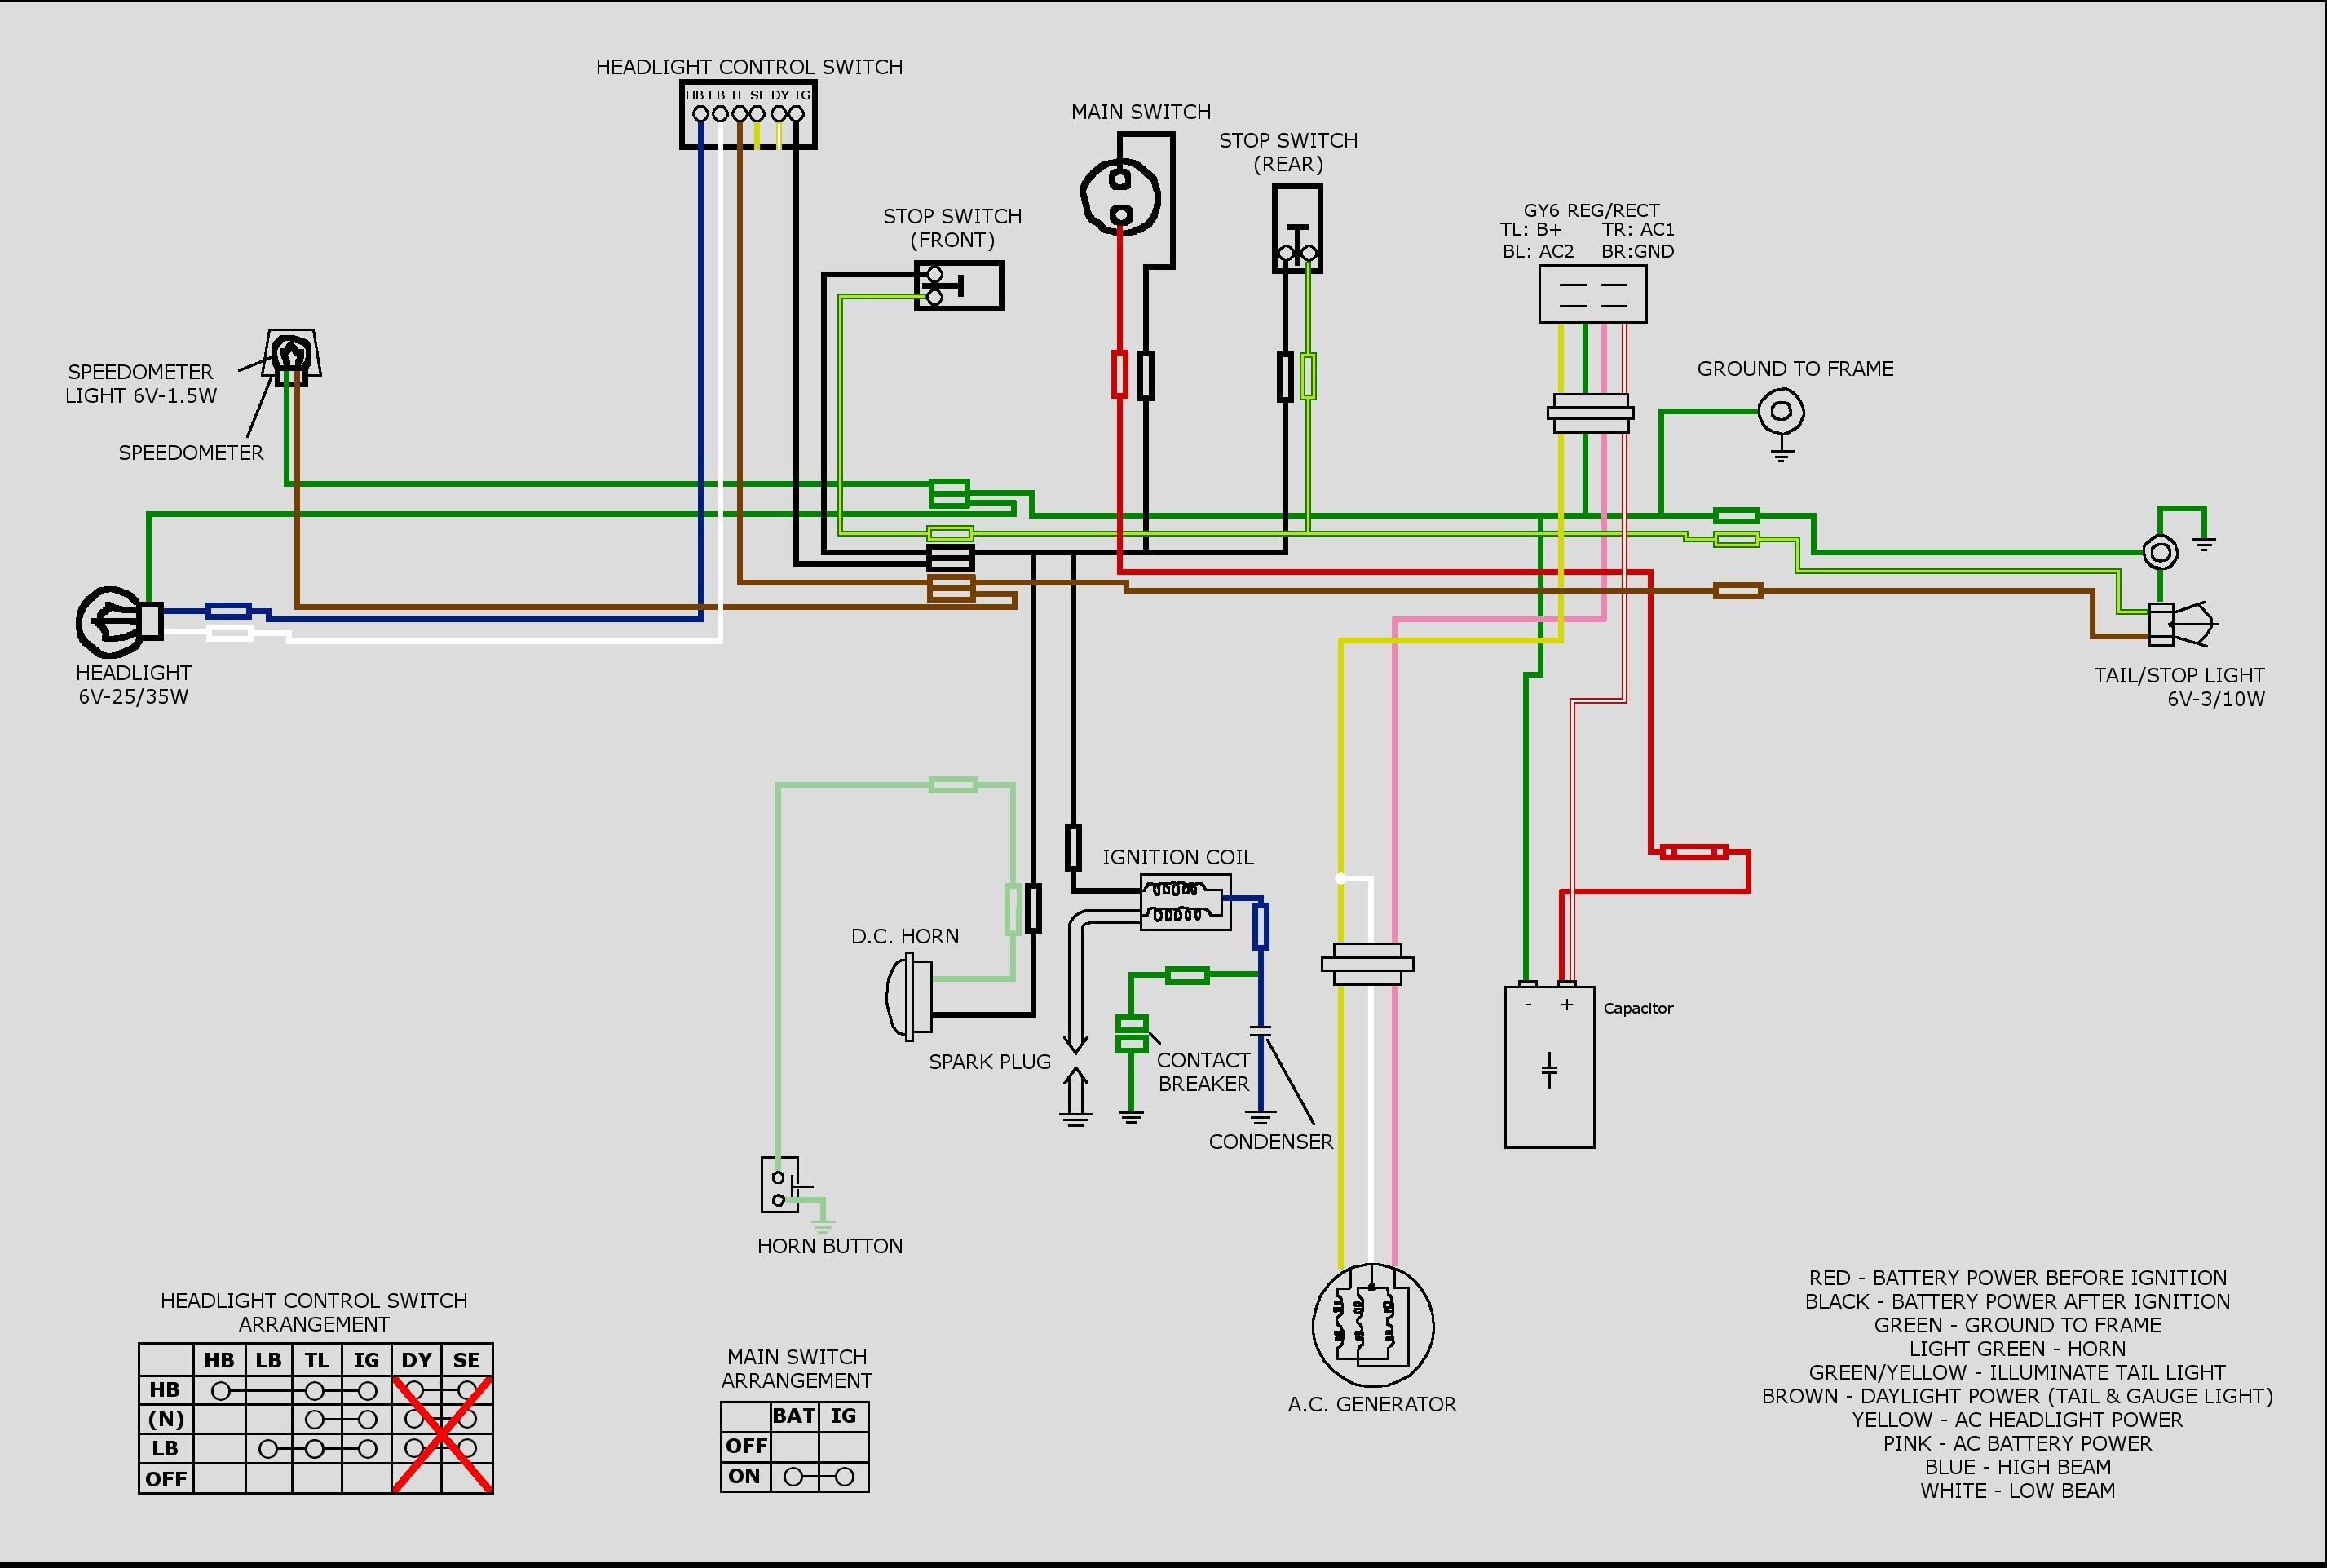 Wiring Diagram For Tao Tao 150cc - Wiring Diagrams Dash